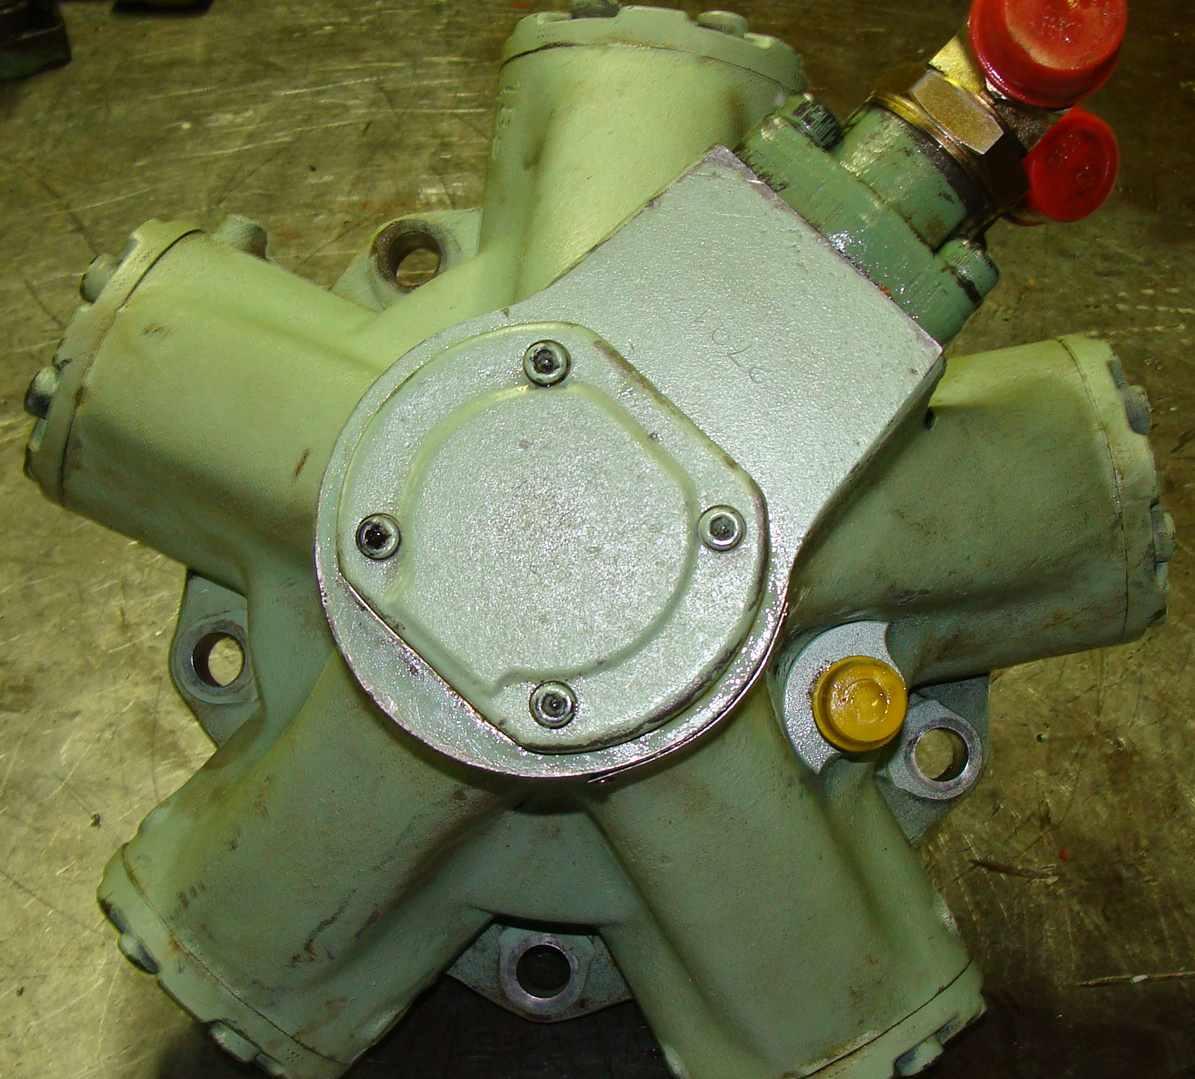 reparation_moteur_hydraulique_staffa_kawasaki.JPG